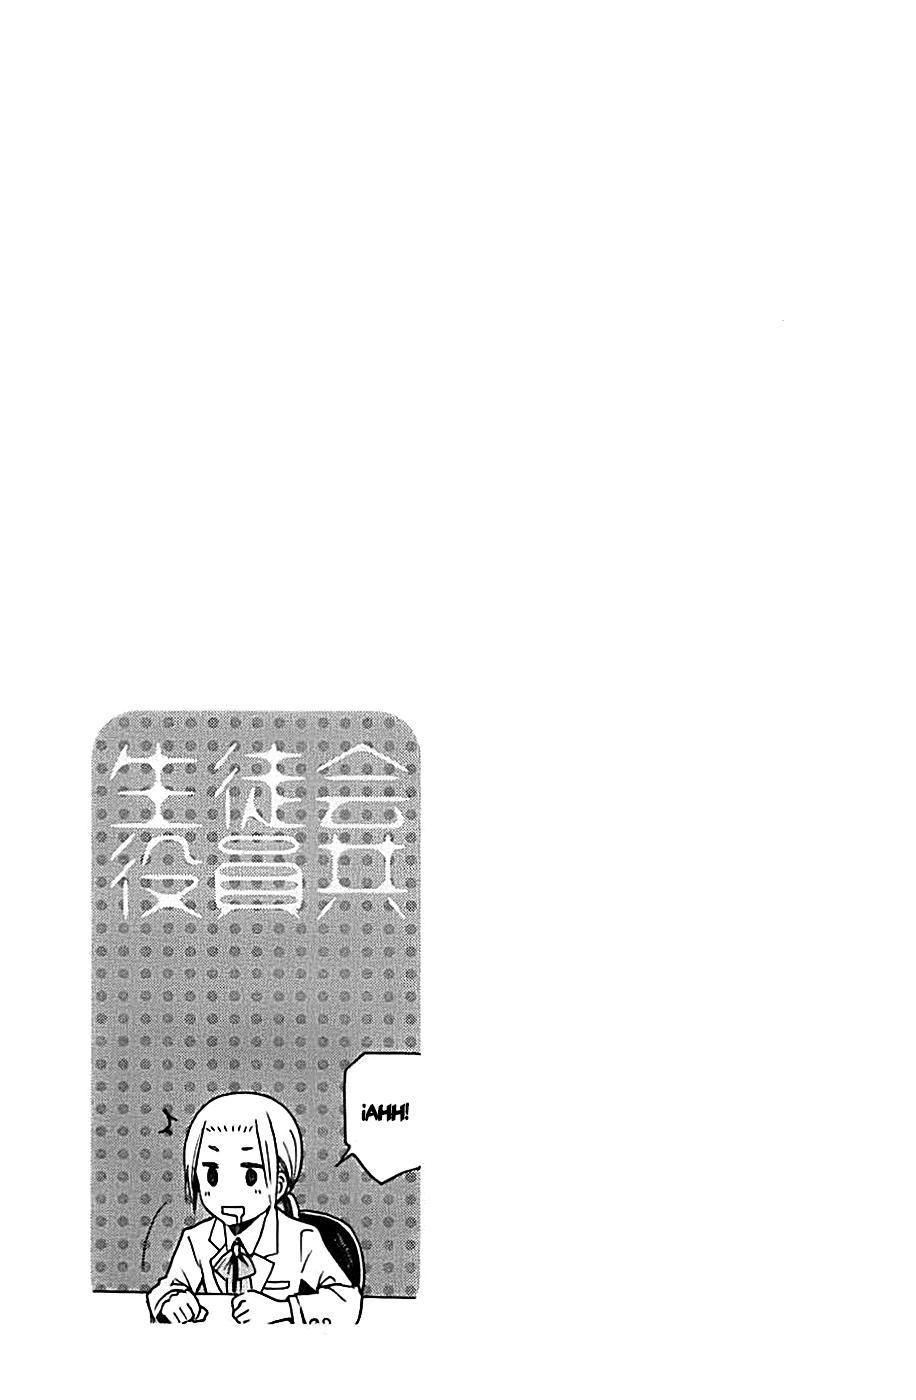 http://c5.ninemanga.com/es_manga/2/17602/412438/5034dfc39324046c2451d67caf662c74.jpg Page 6